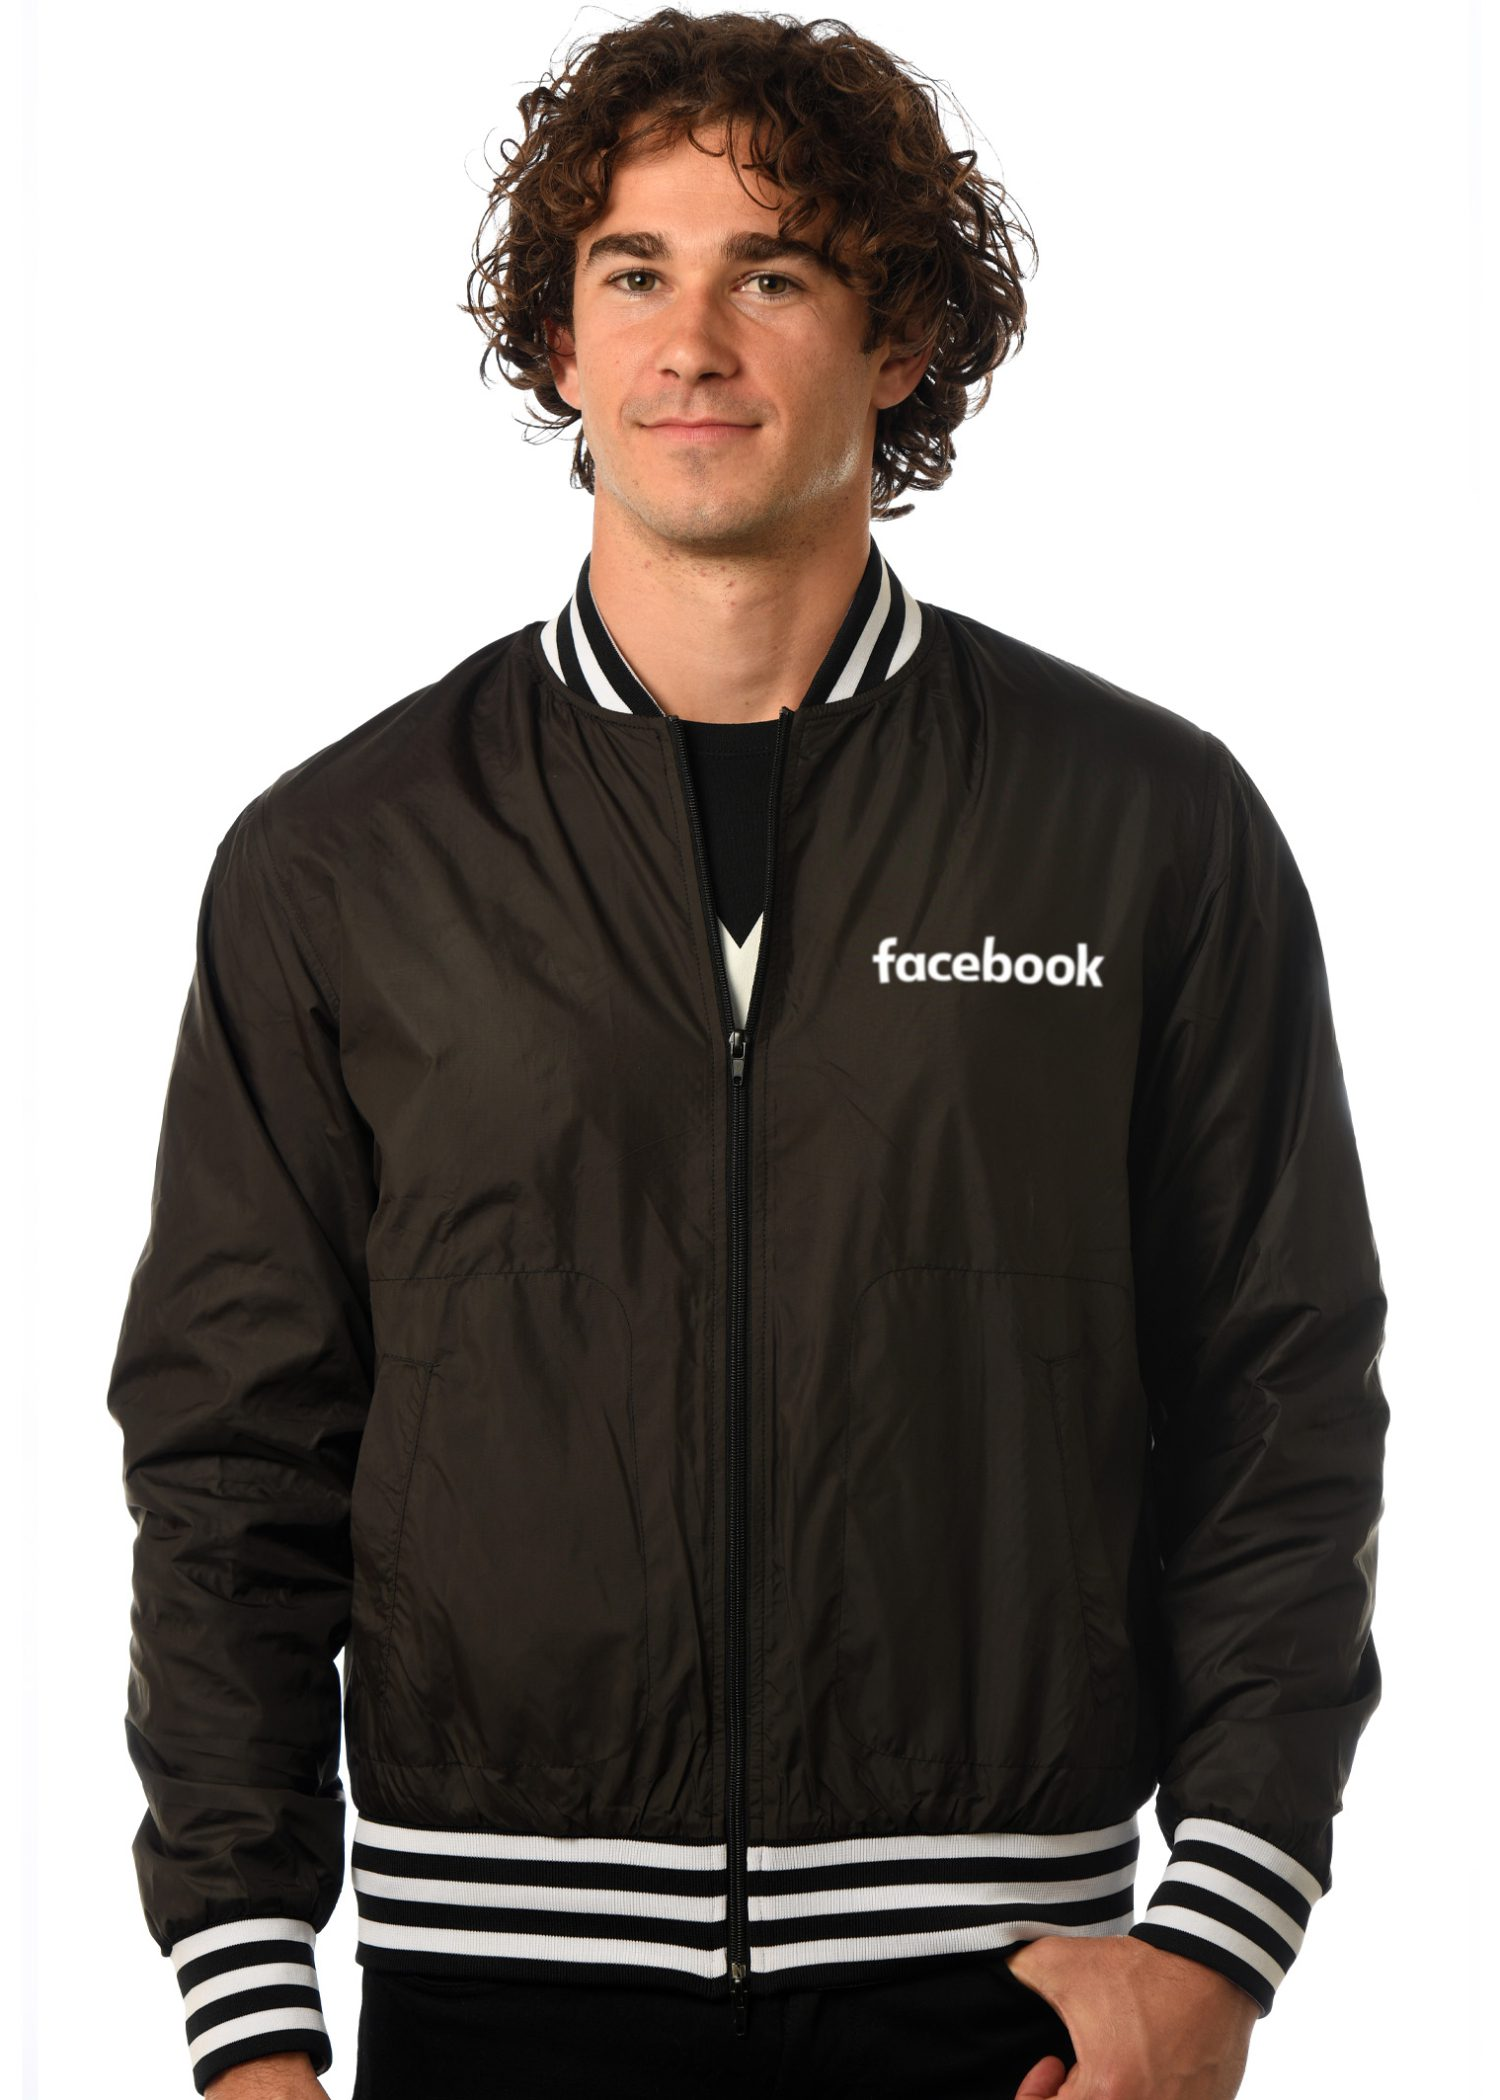 GG 912-Coaches jackets-main rev